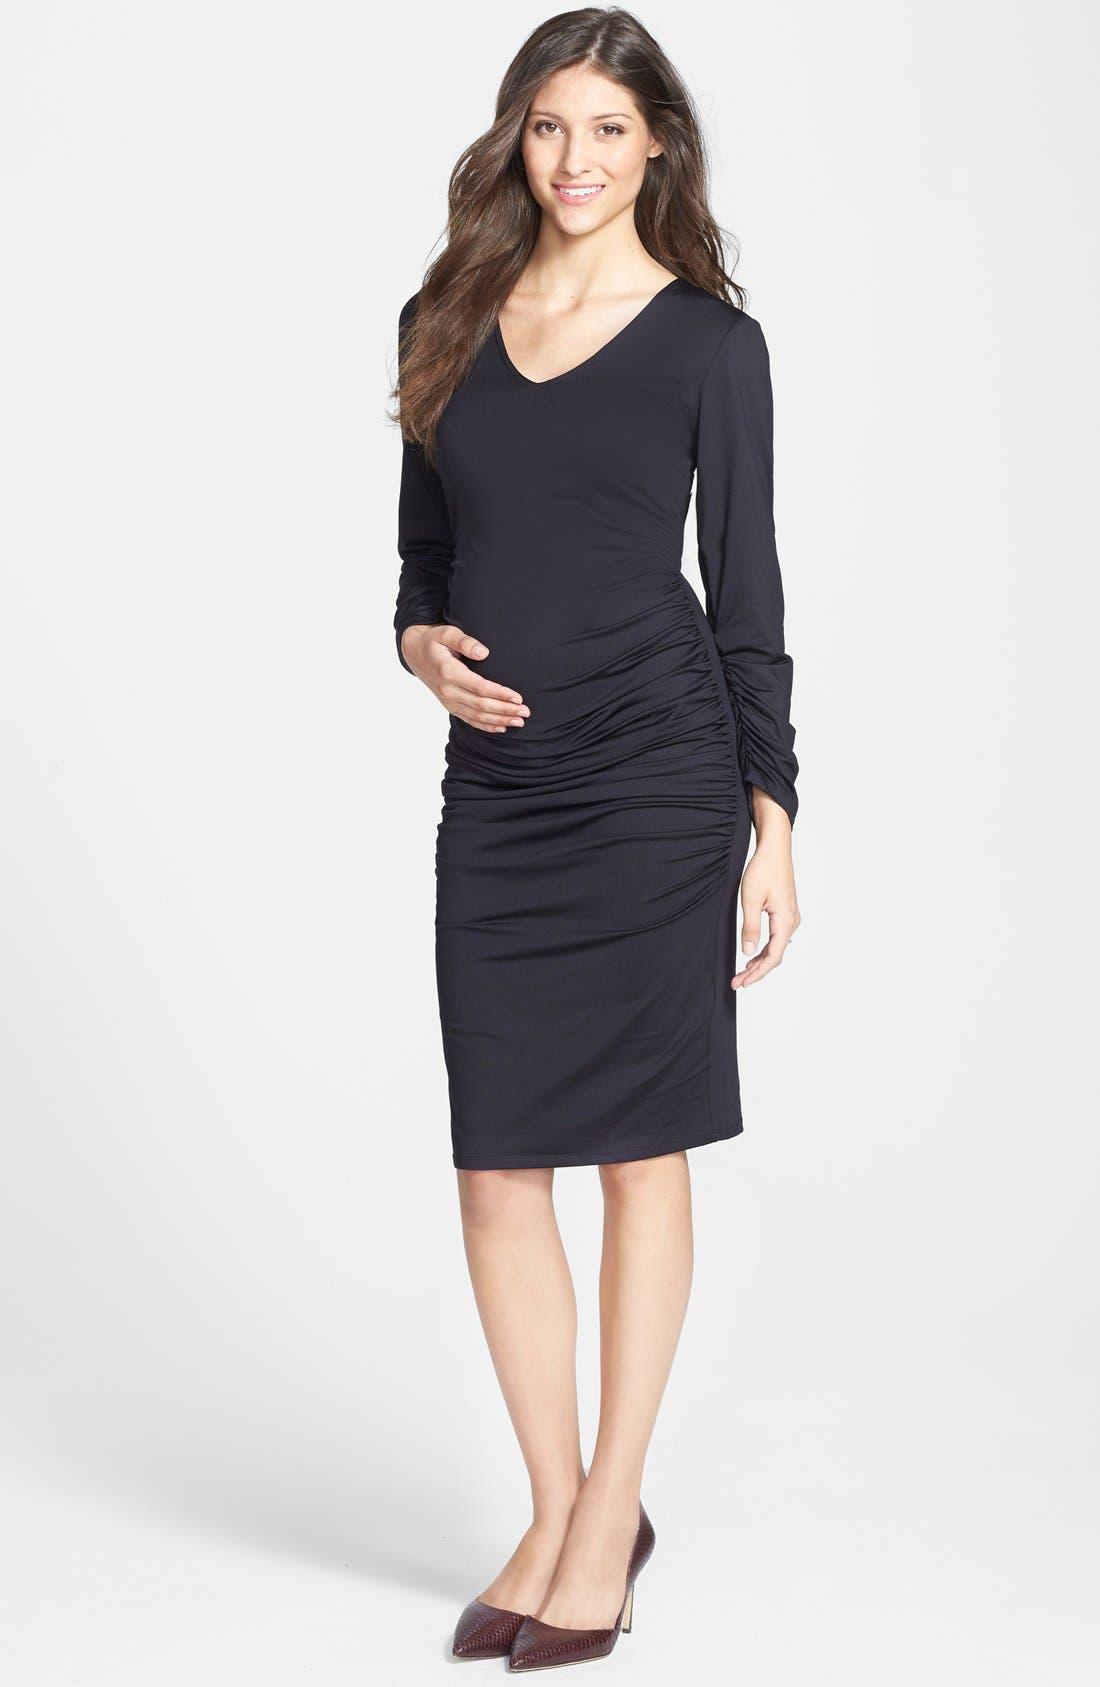 Main Image - Eva Alexander London Ruched Maternity Midi Dress